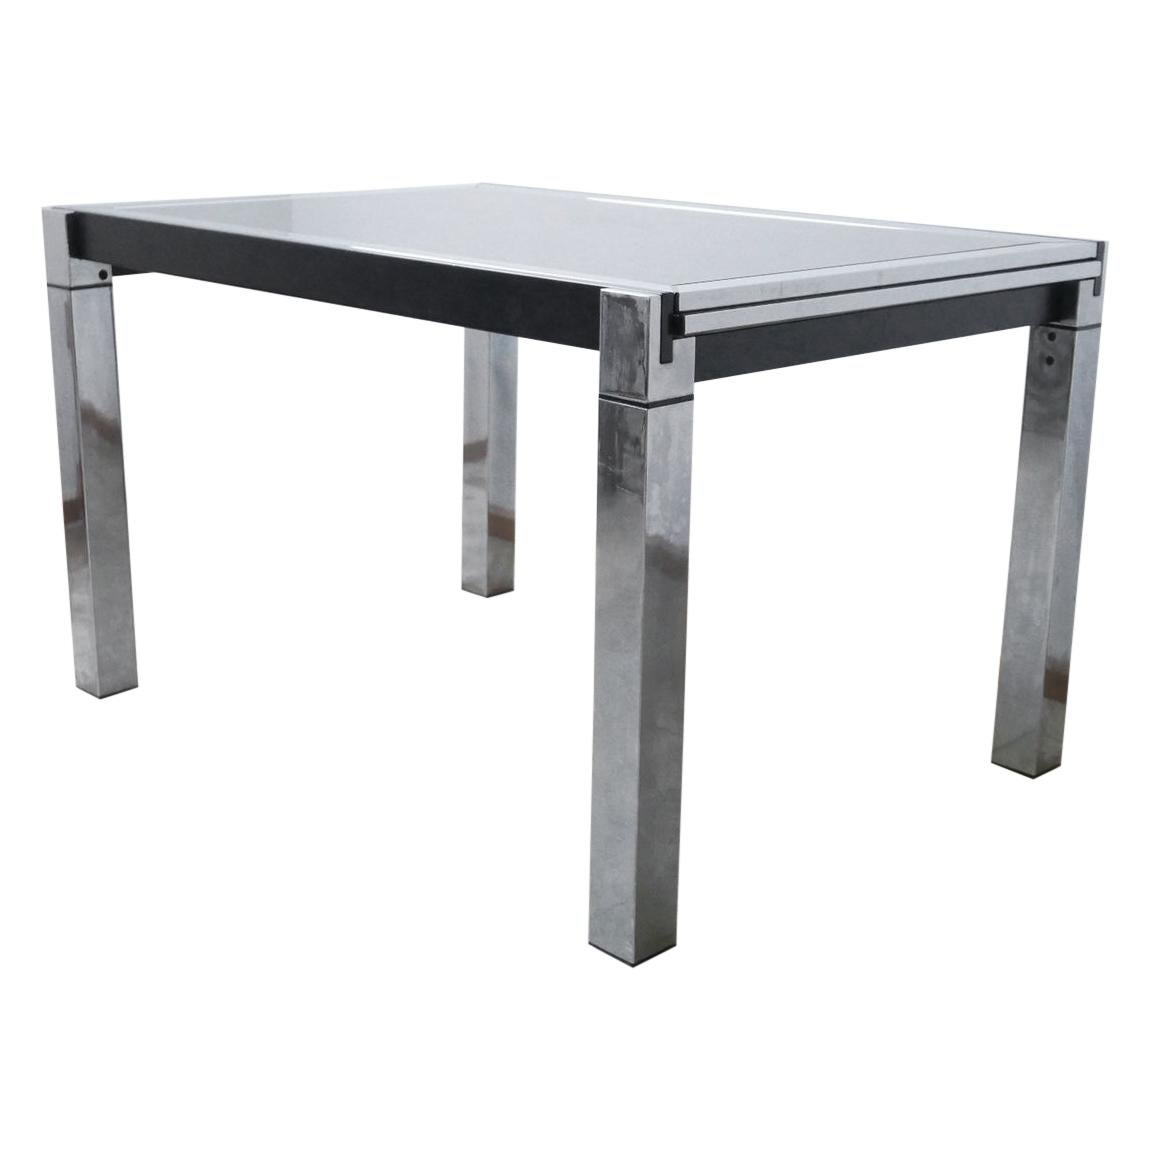 Midcentury Italian Chrome Extendable Dining Table